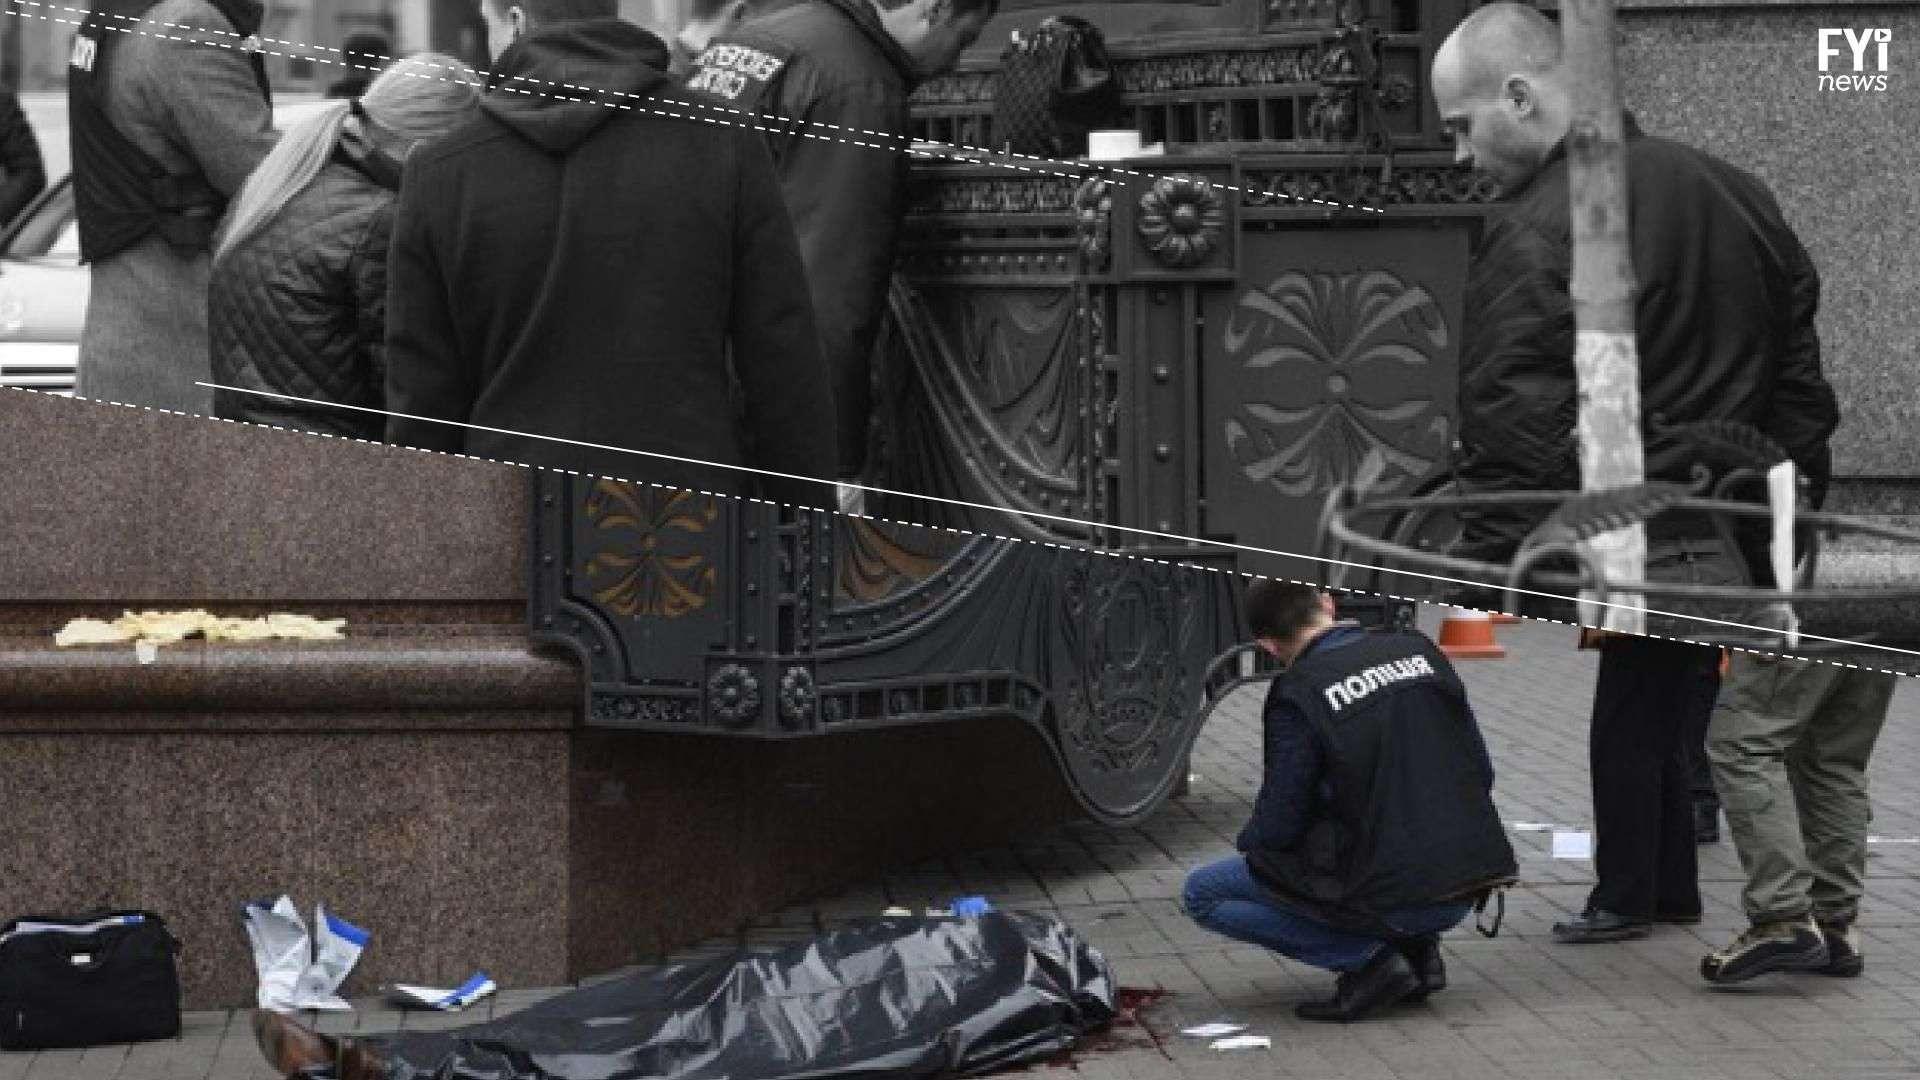 Asesinato de opositor ruso en Ucrania crea tensión